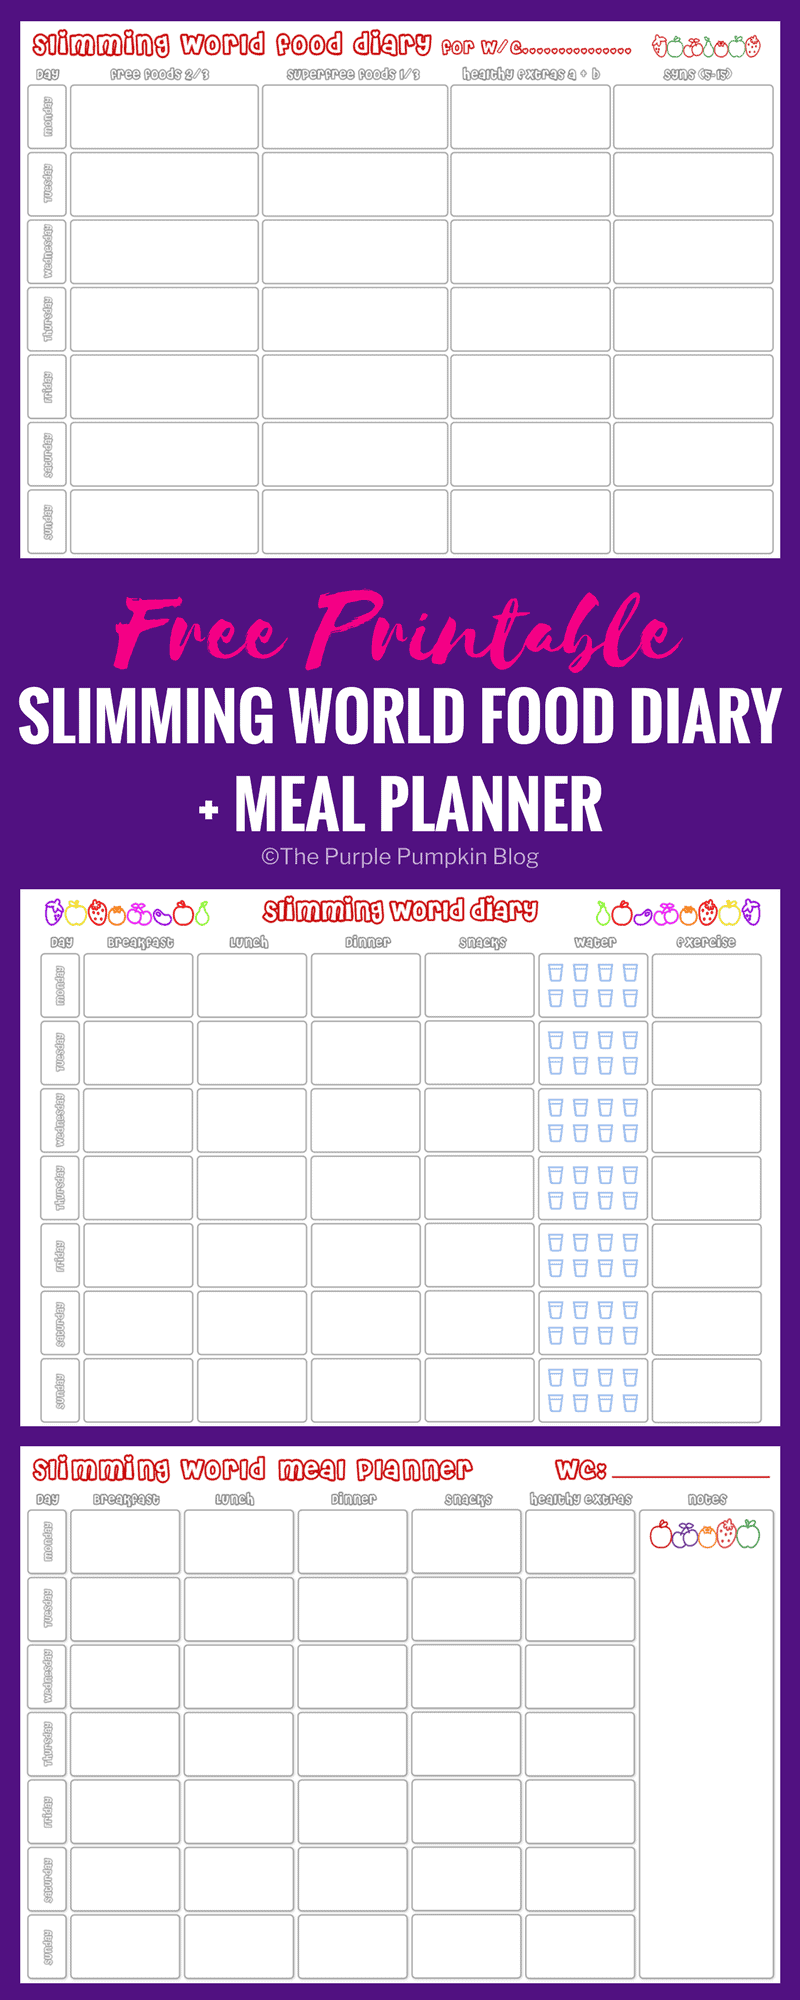 Slimming World Food Diary Printable Meal Planner